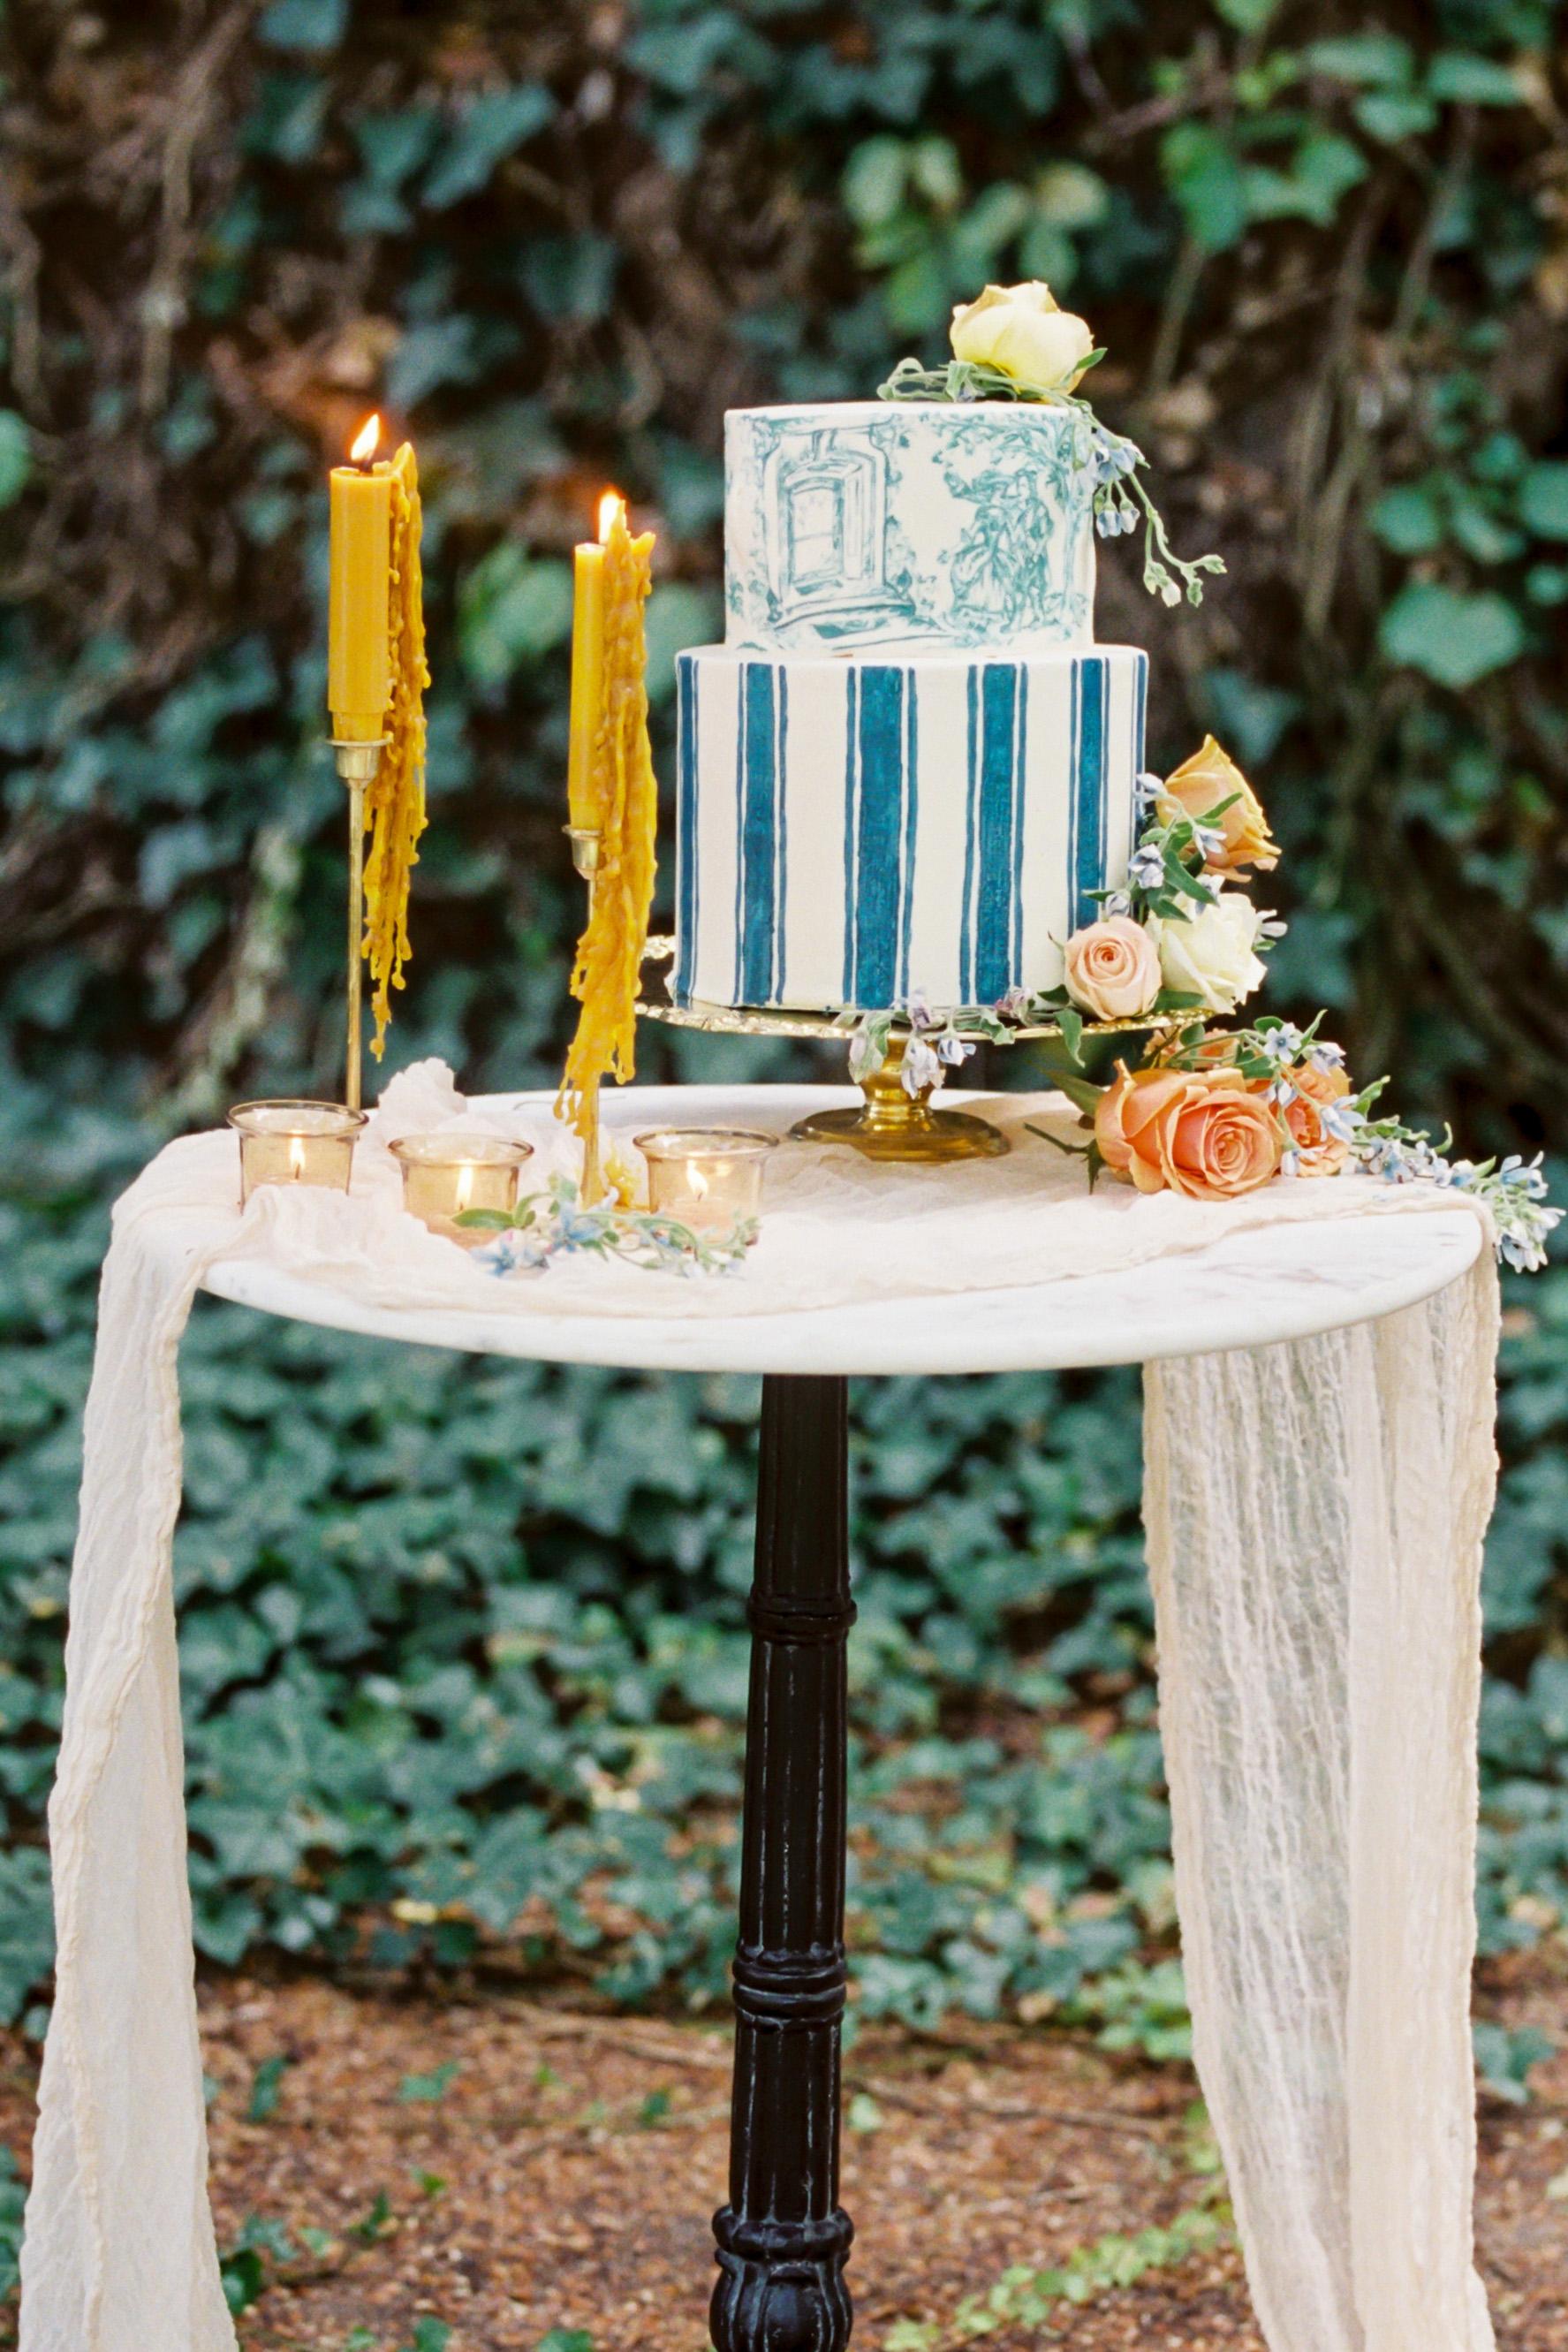 Royal wedding meghan markle Prince Harry 2019 cake